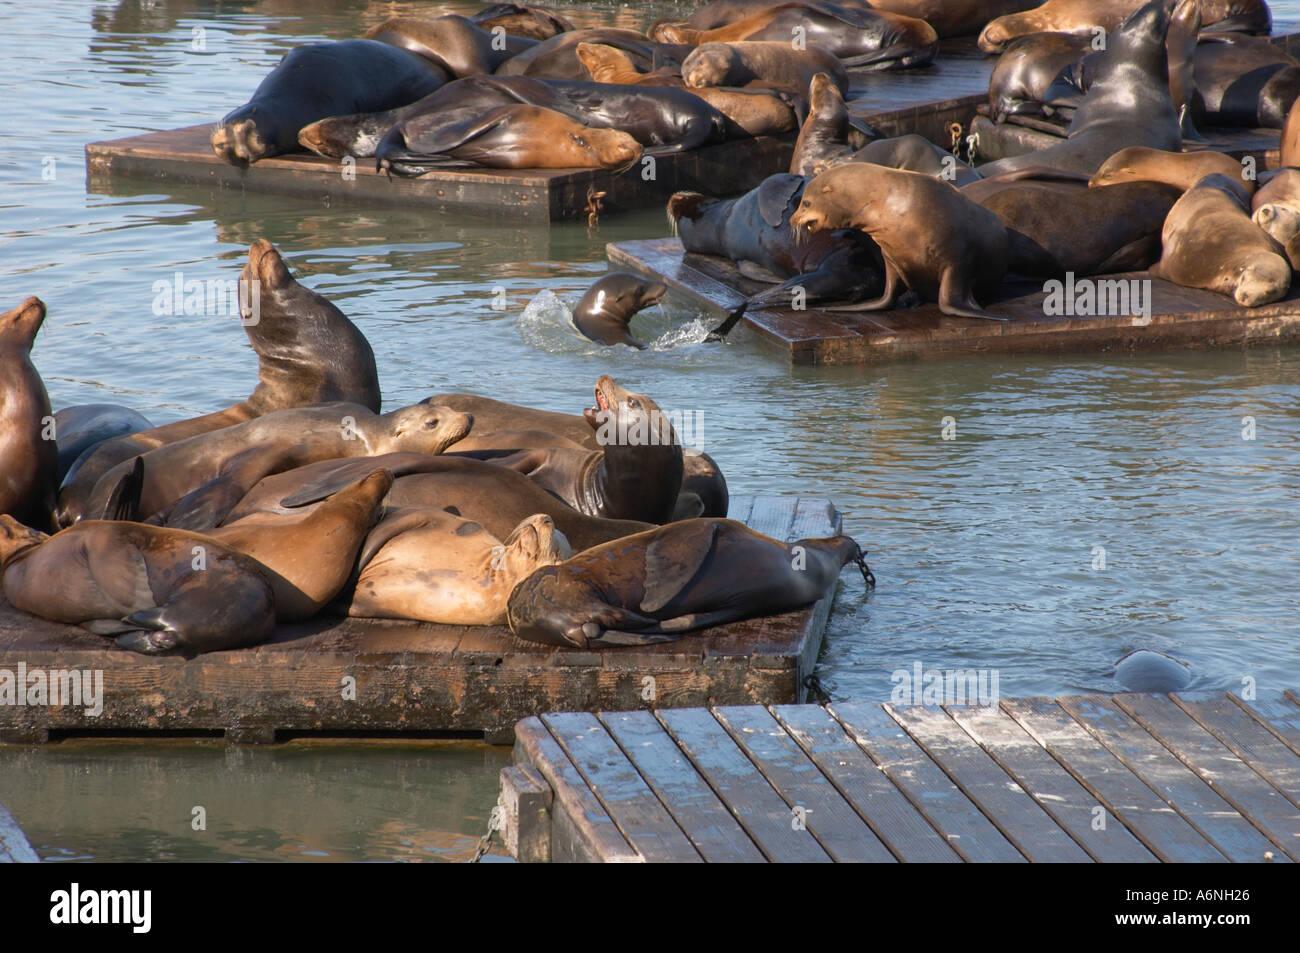 Seals On Floats As Fisherman S Wharf San Francisco Bay California Stock Photo Alamy